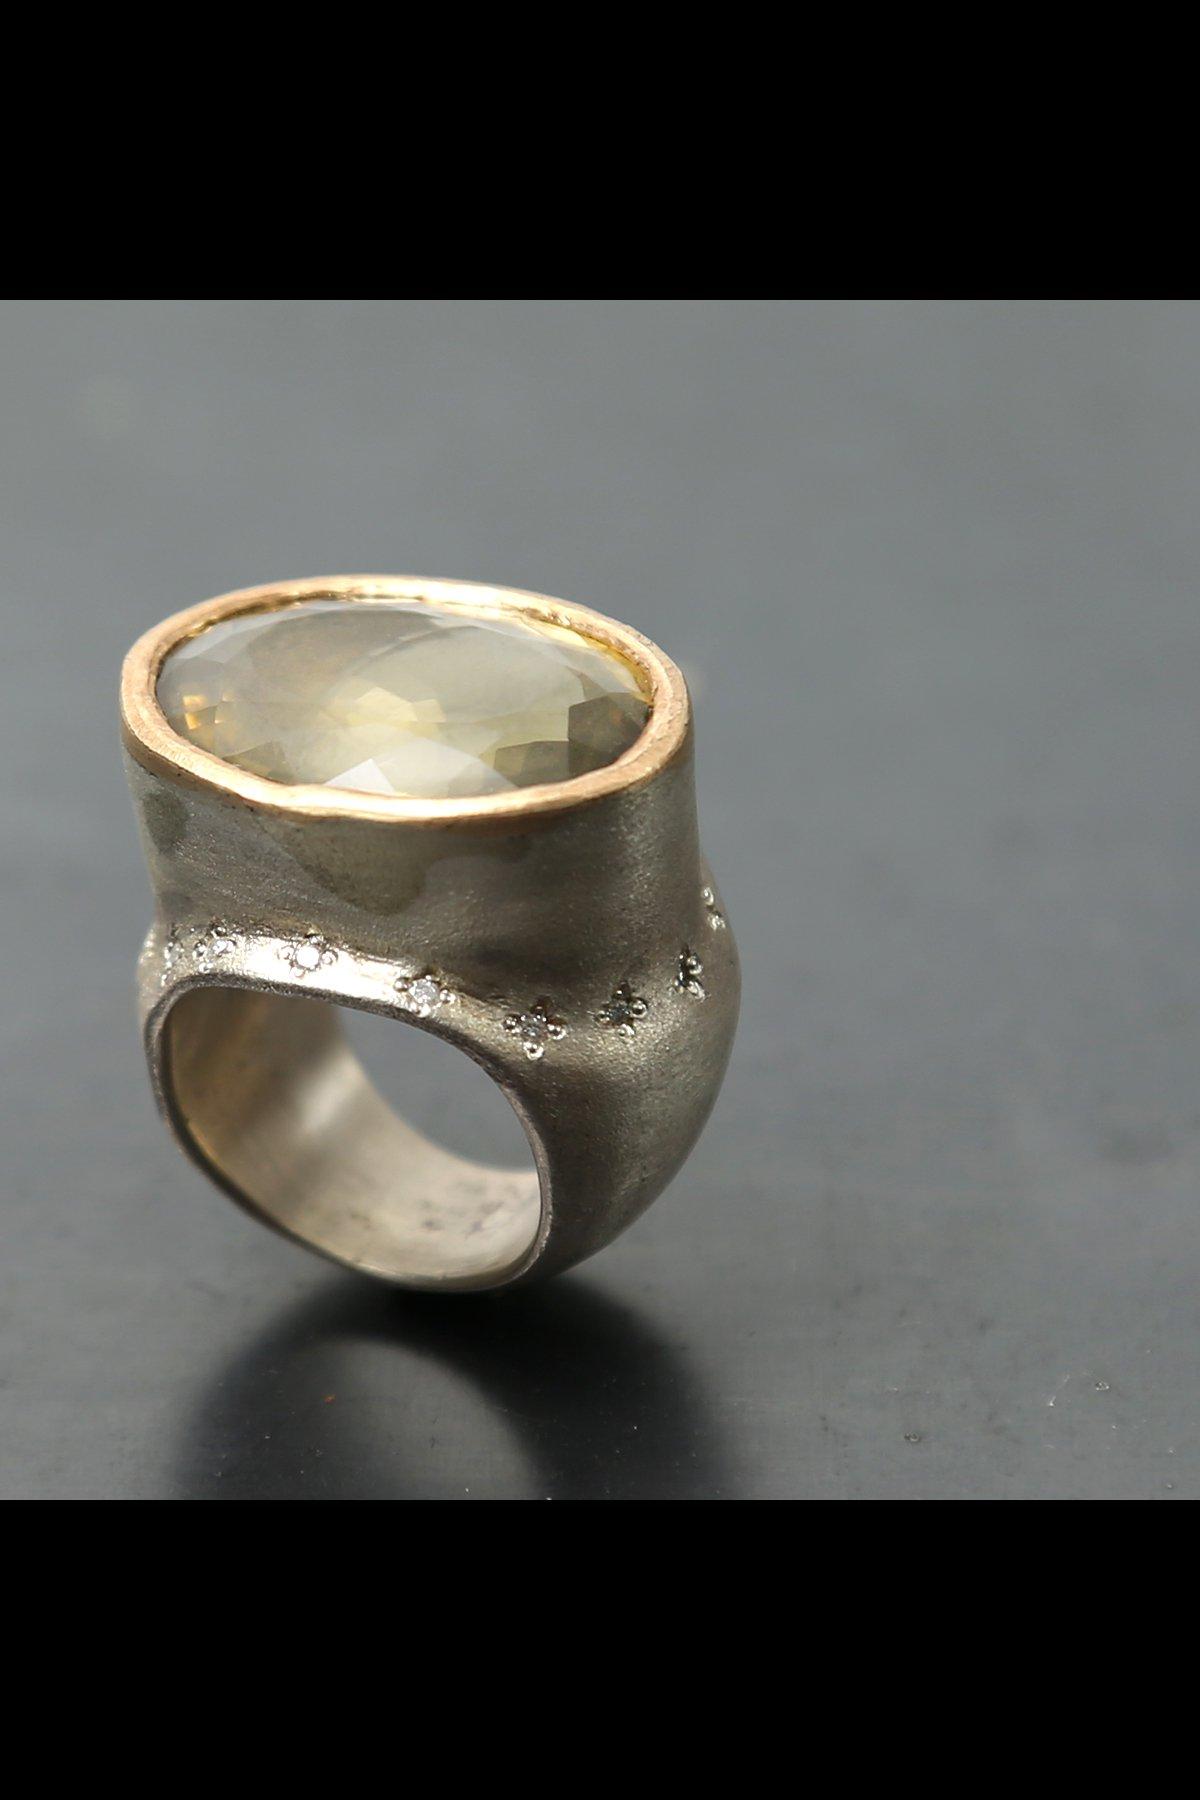 JEWEL RING N.8A-OGR6